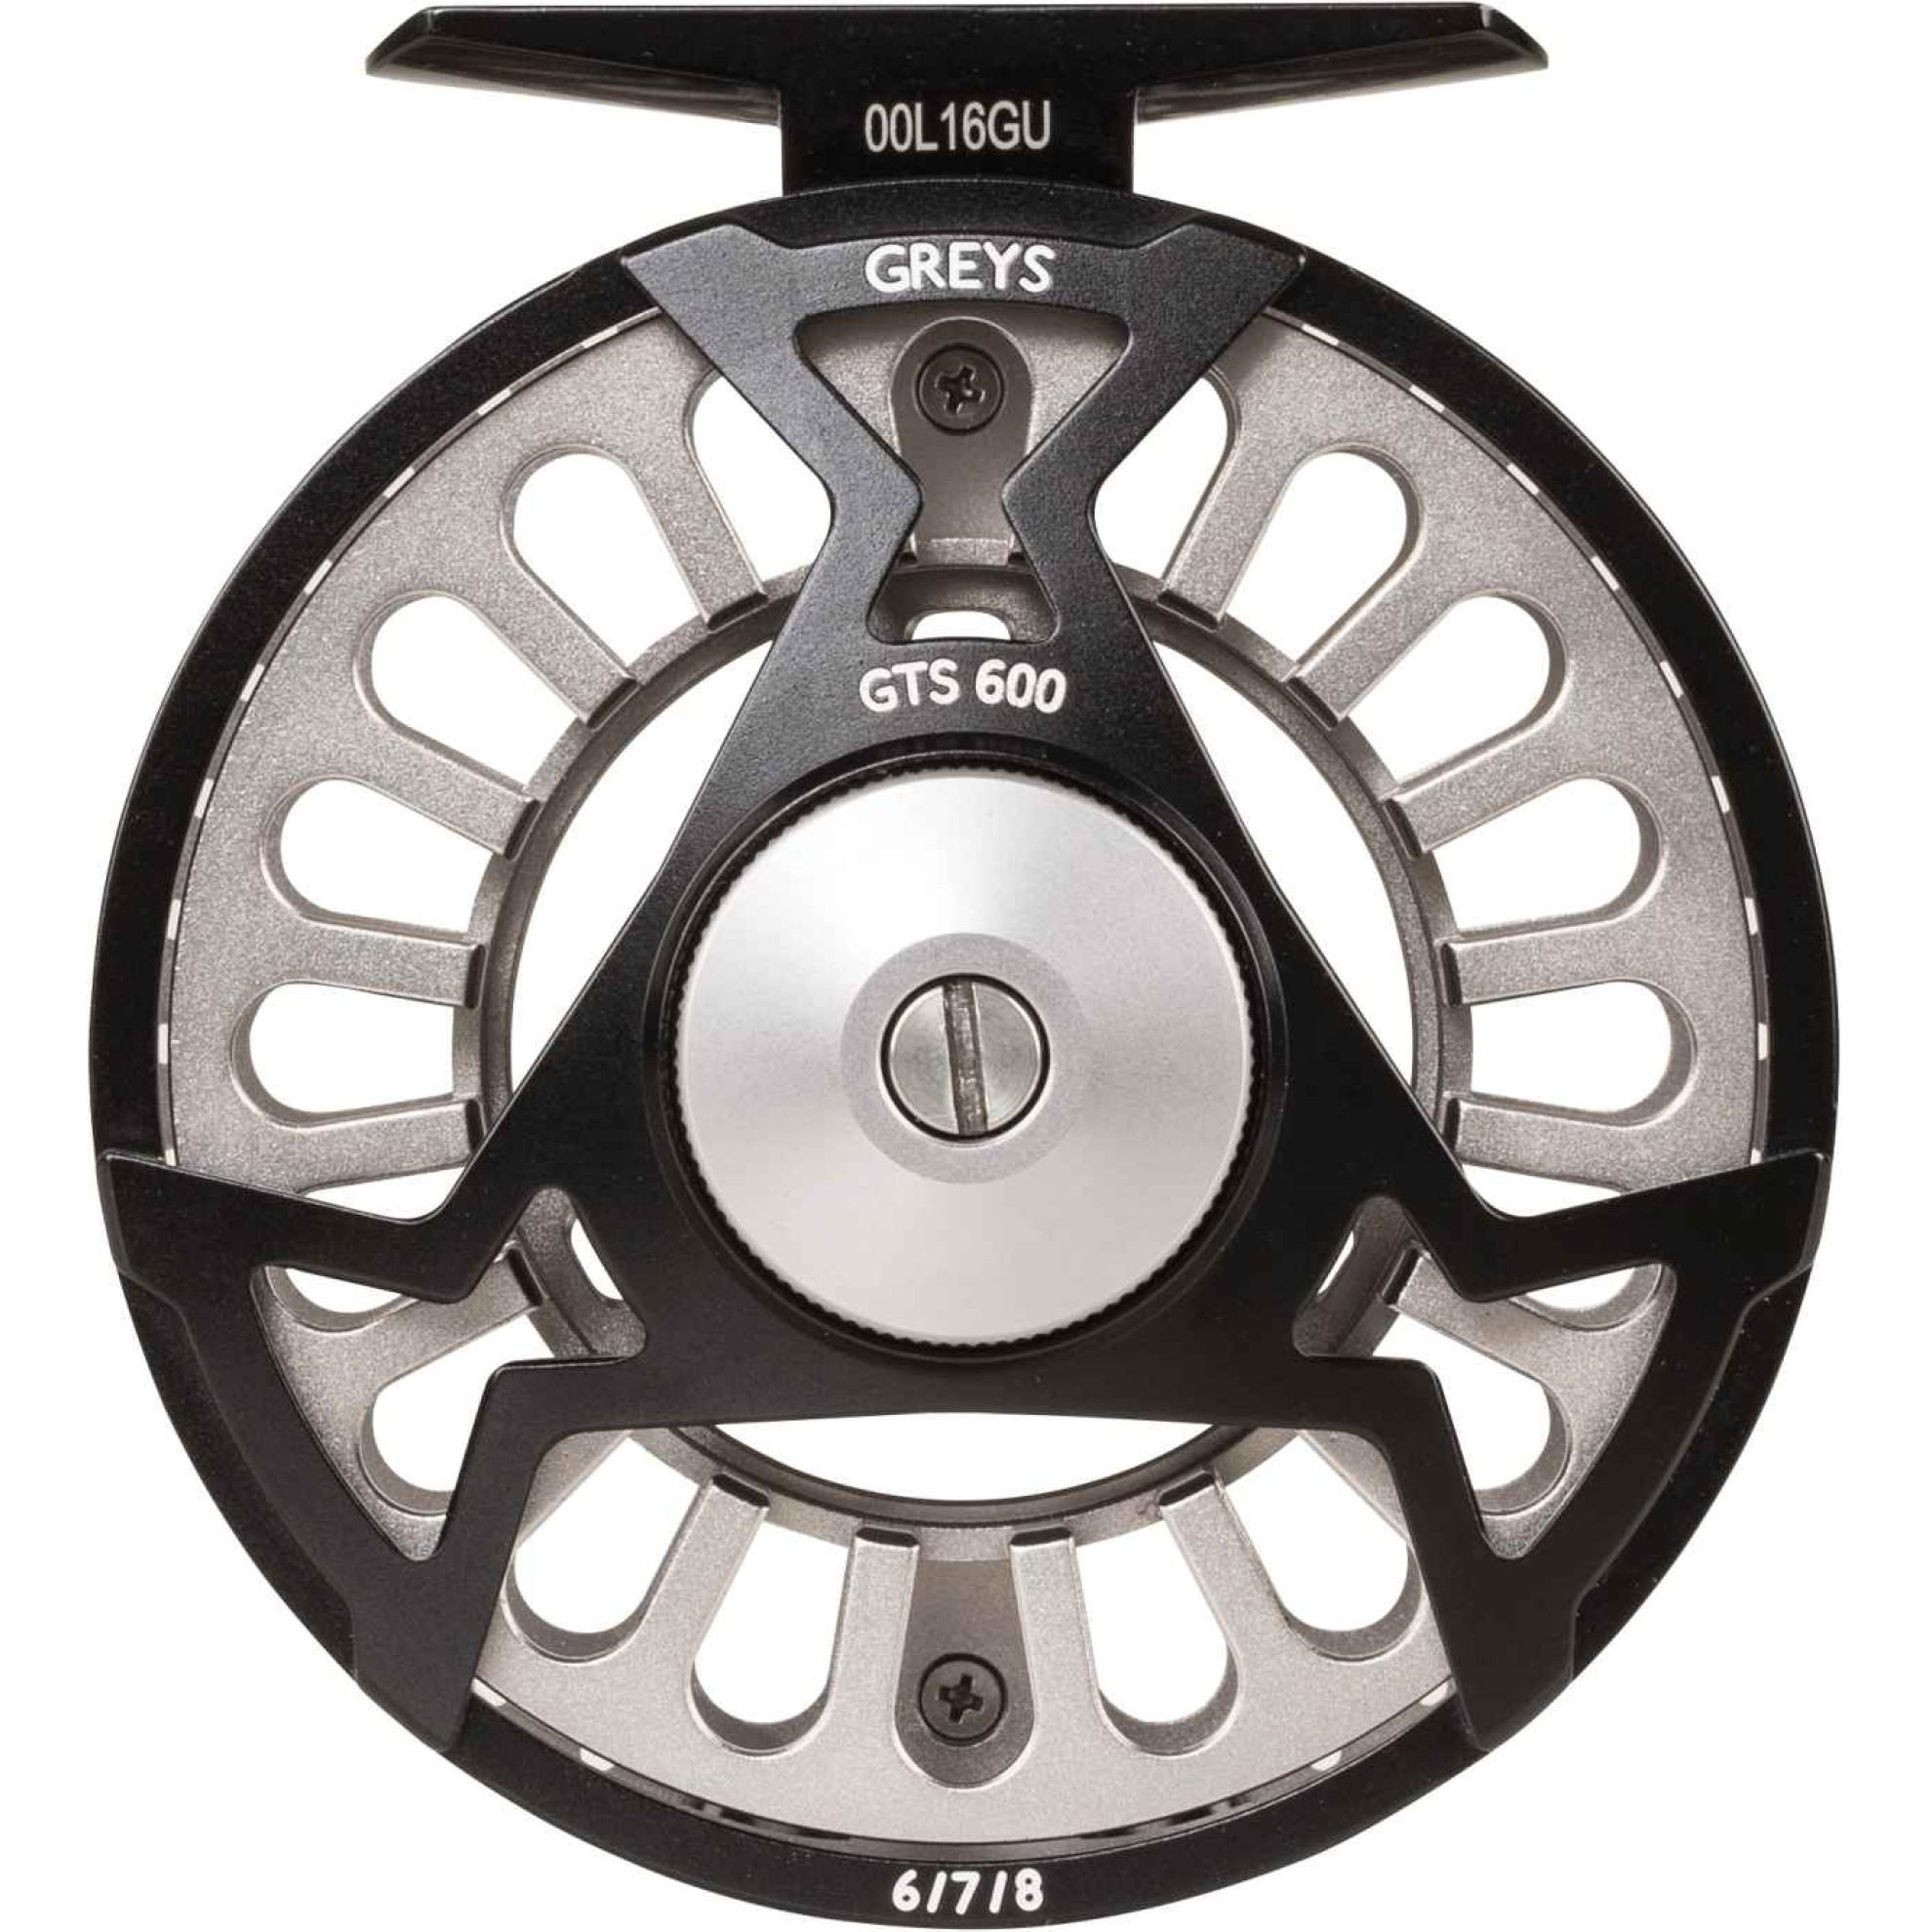 Greys GTS 300 Spare spool